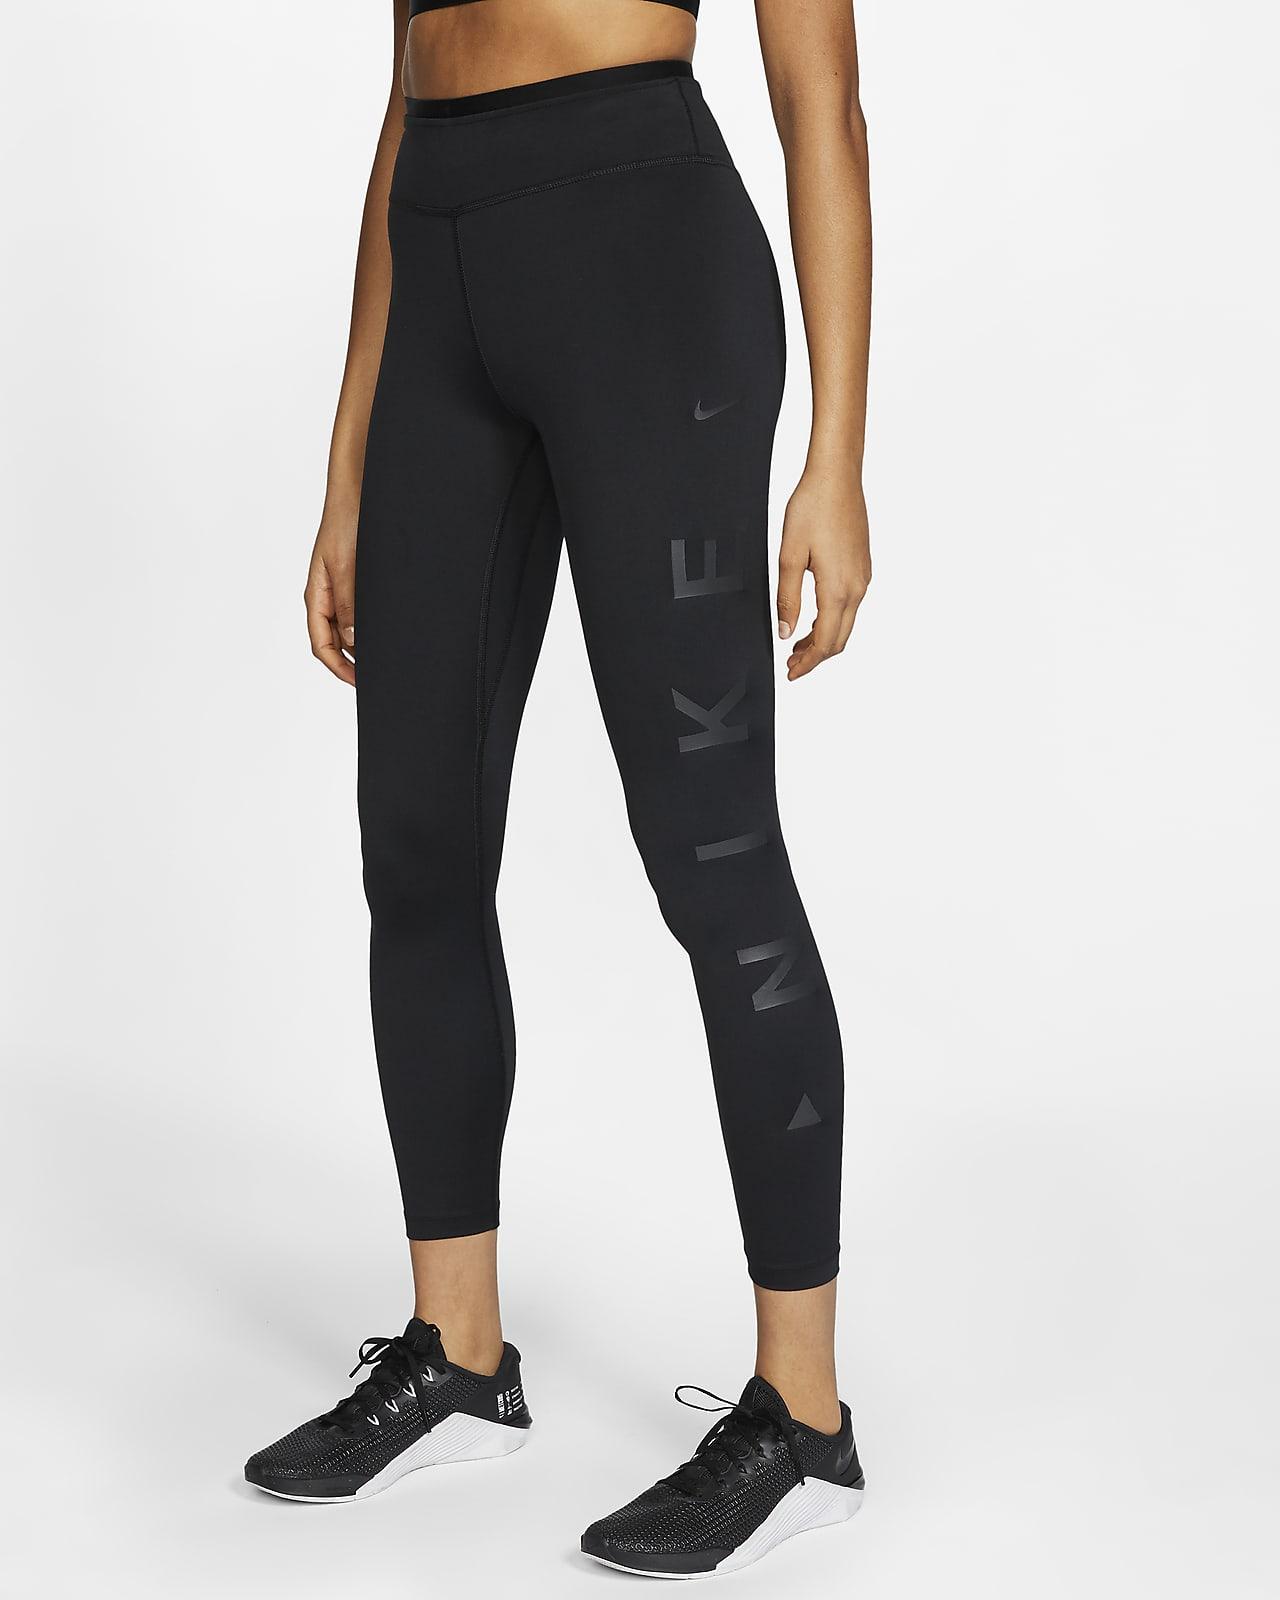 Nike One Icon Clash 7/8-tights met halfhoge taille en graphic voor dames